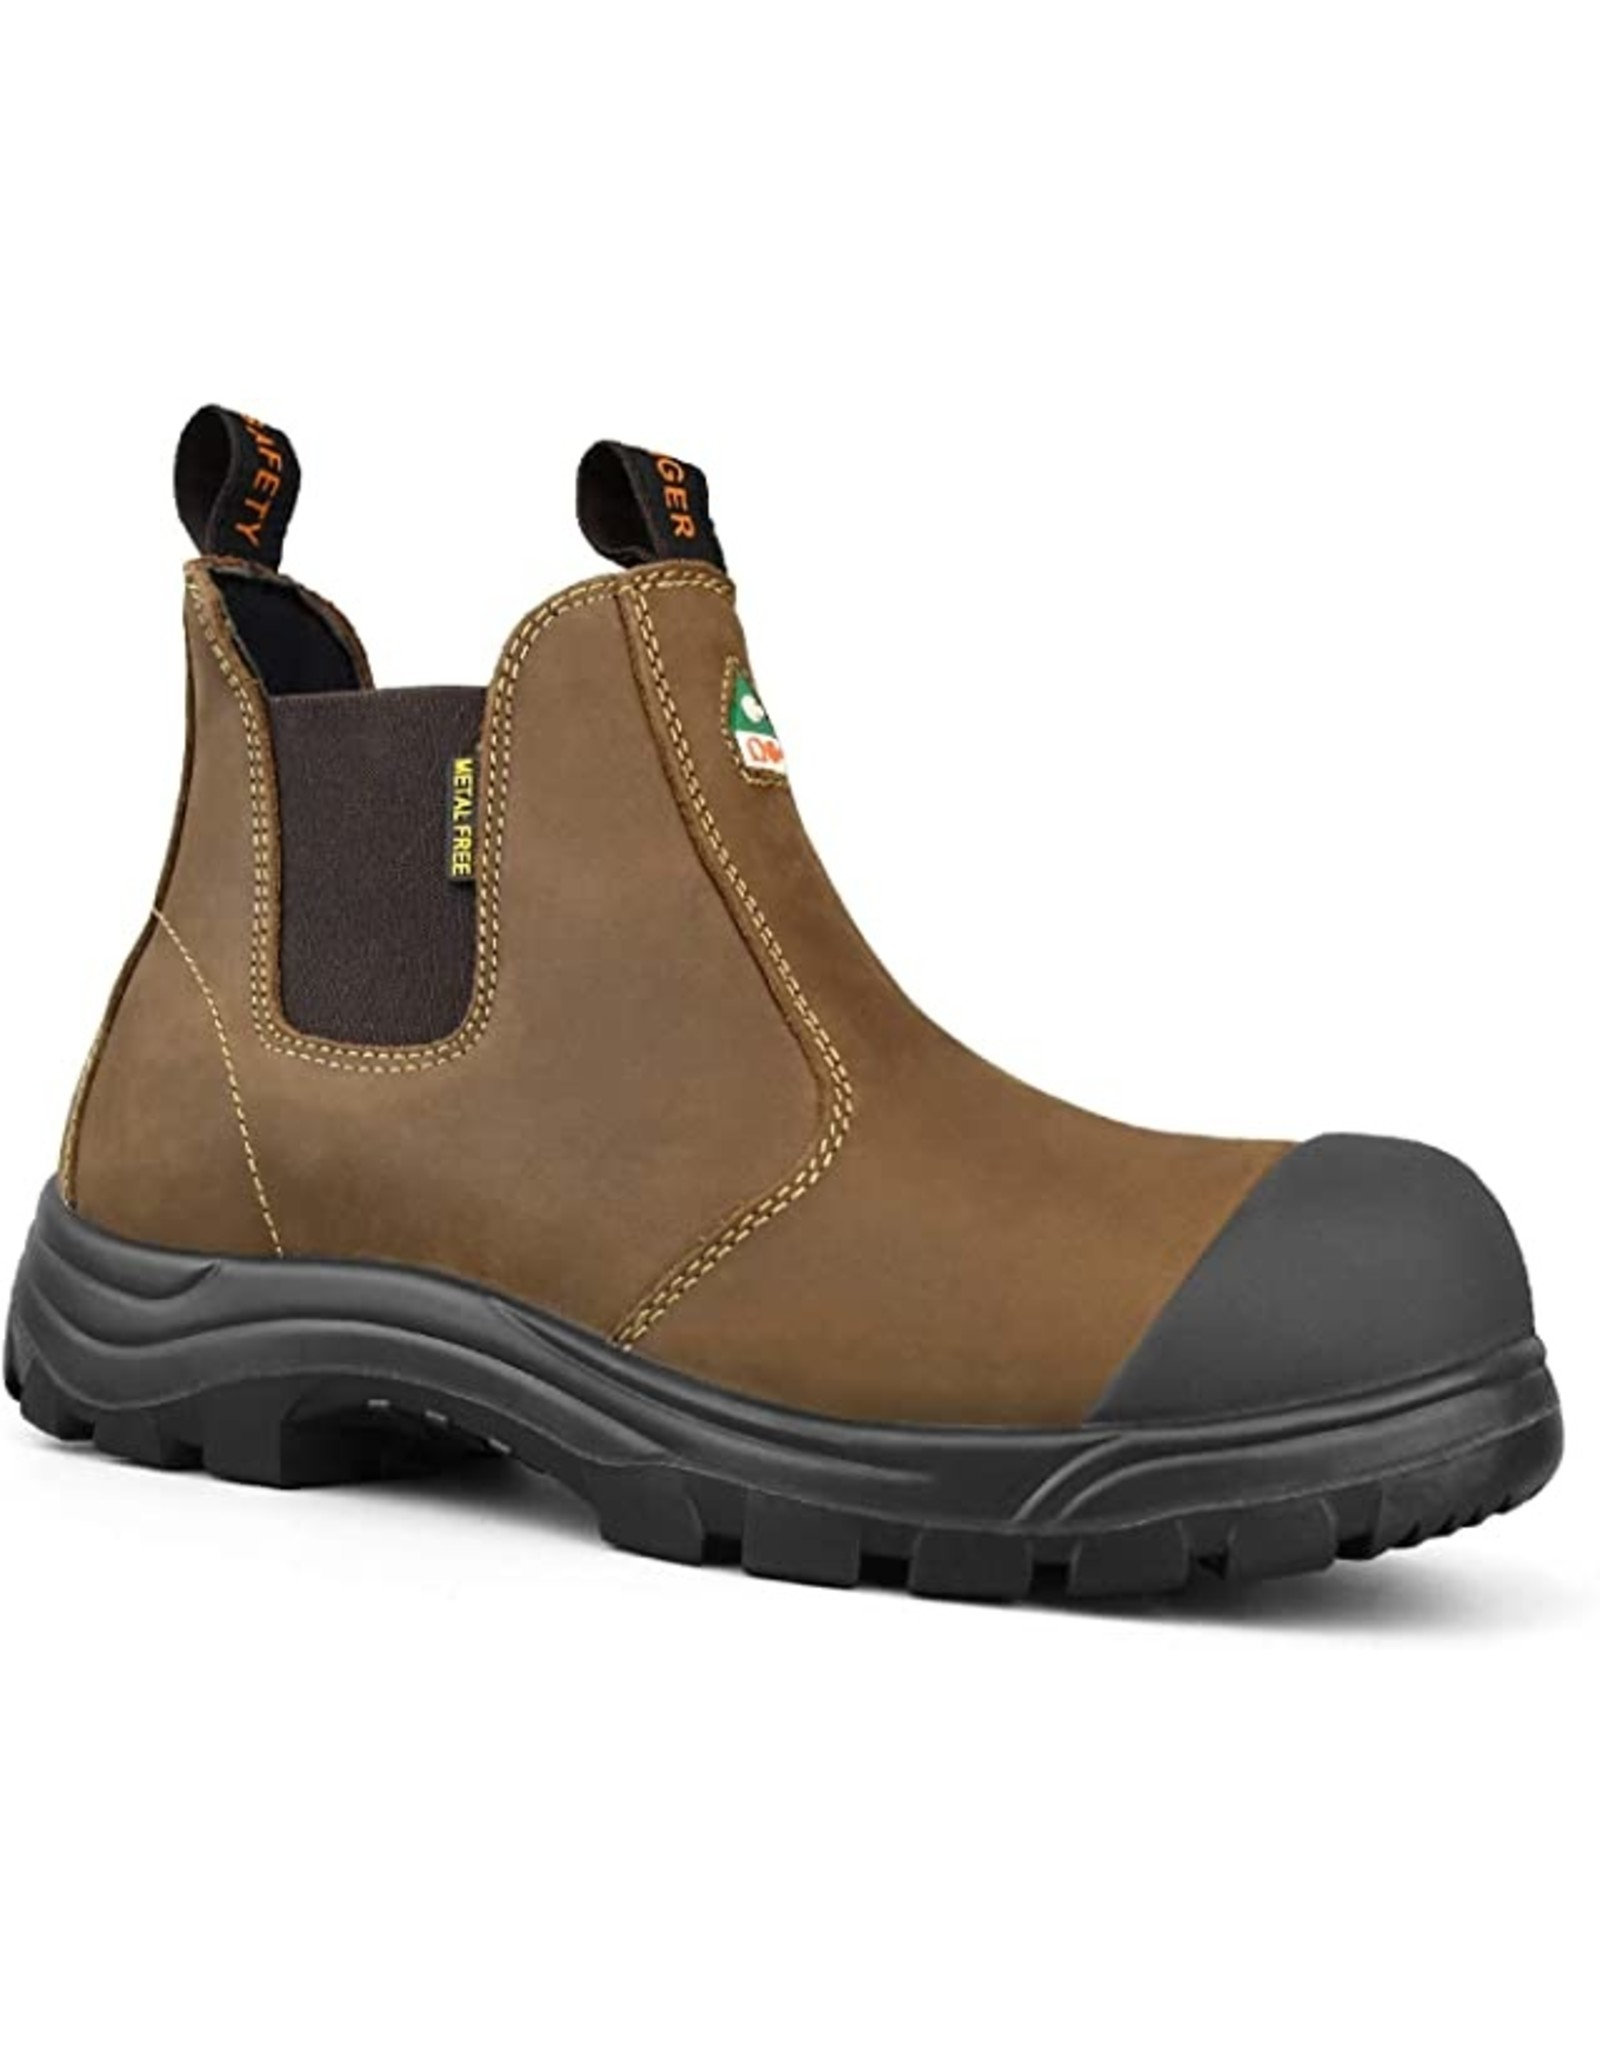 TIGER SAFETY 5977-C SLIP ON SAFETY BOOT